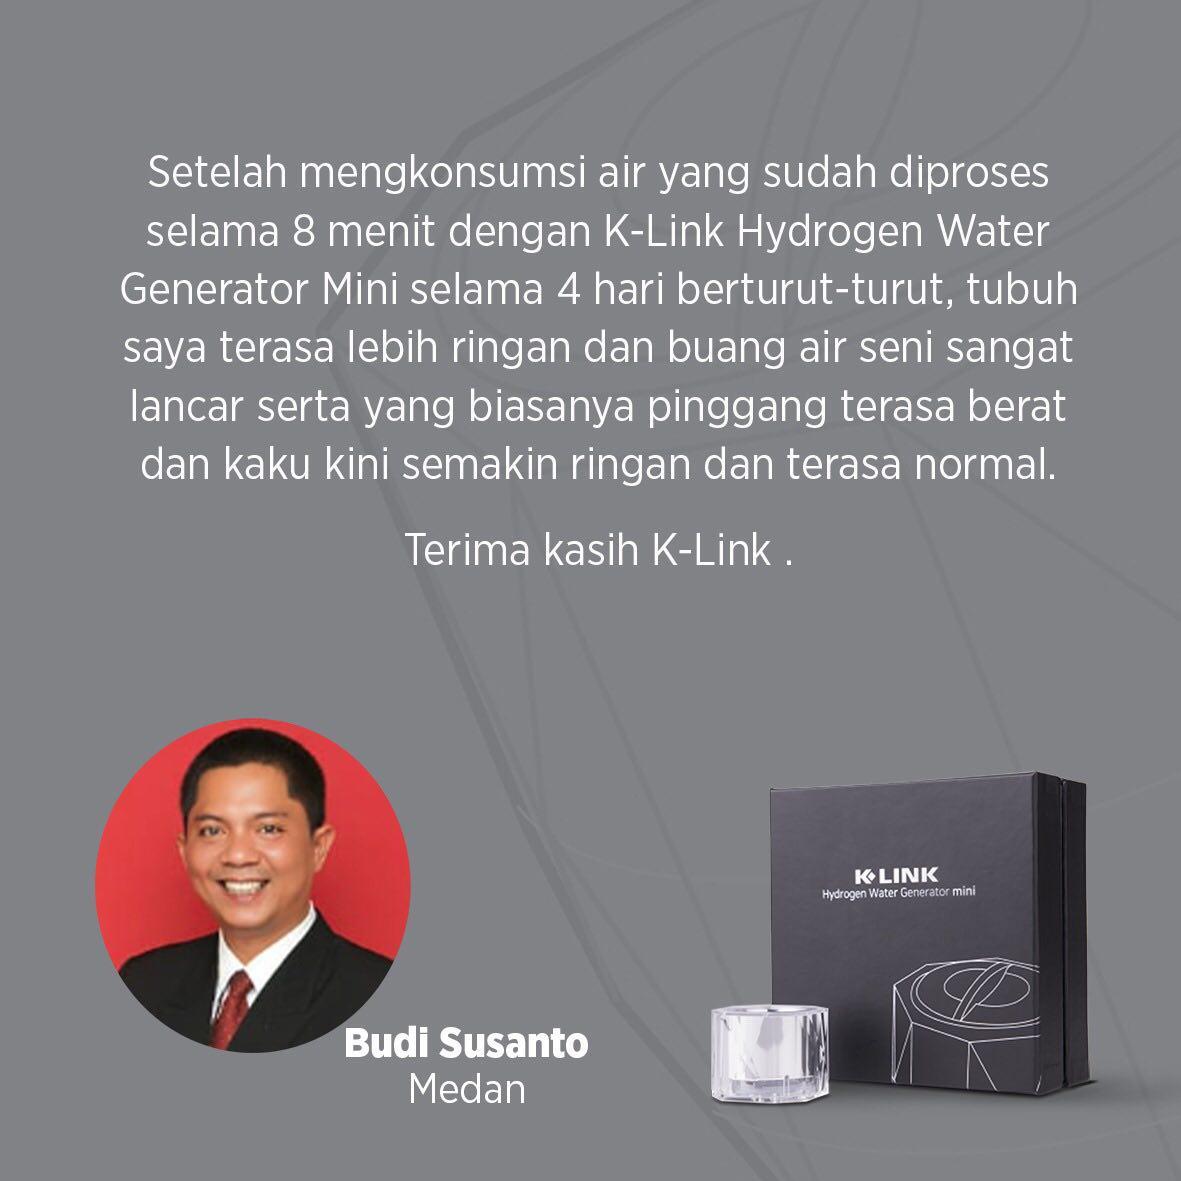 Testimony Hydrogen Water Generator mini